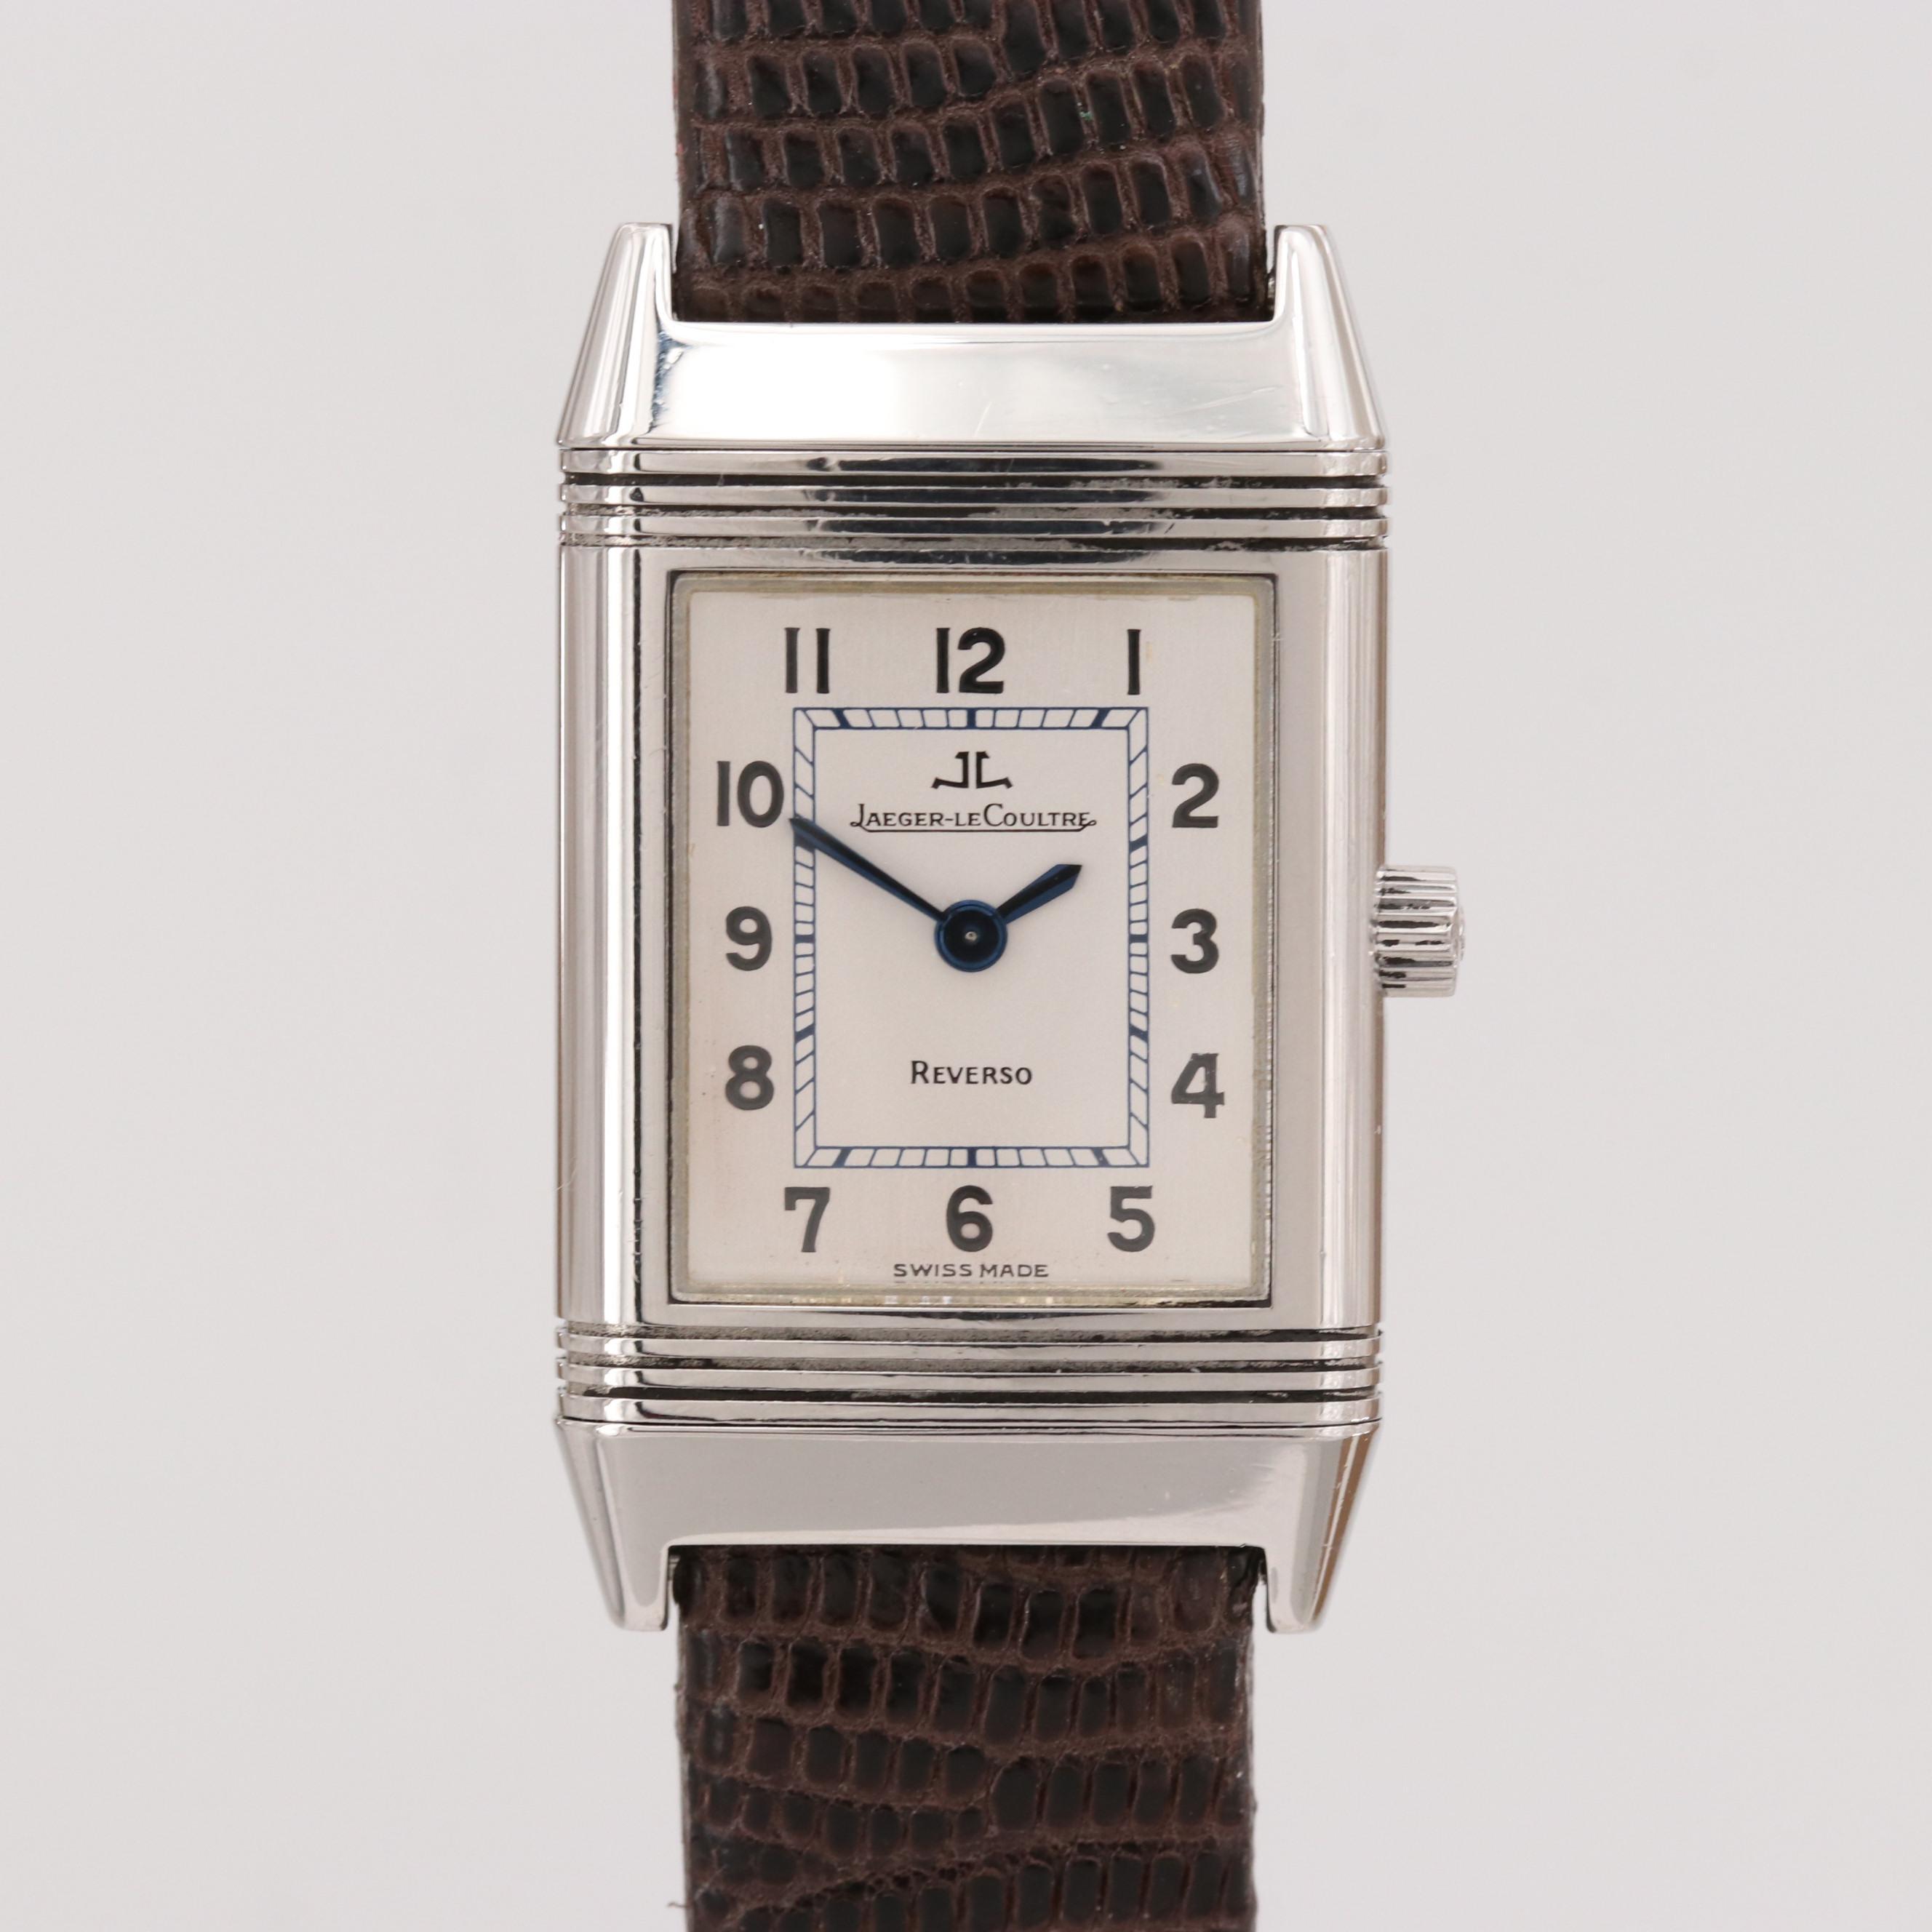 Jaeger-LeCoultre Reverso Stainless Steel Quartz Wristwatch